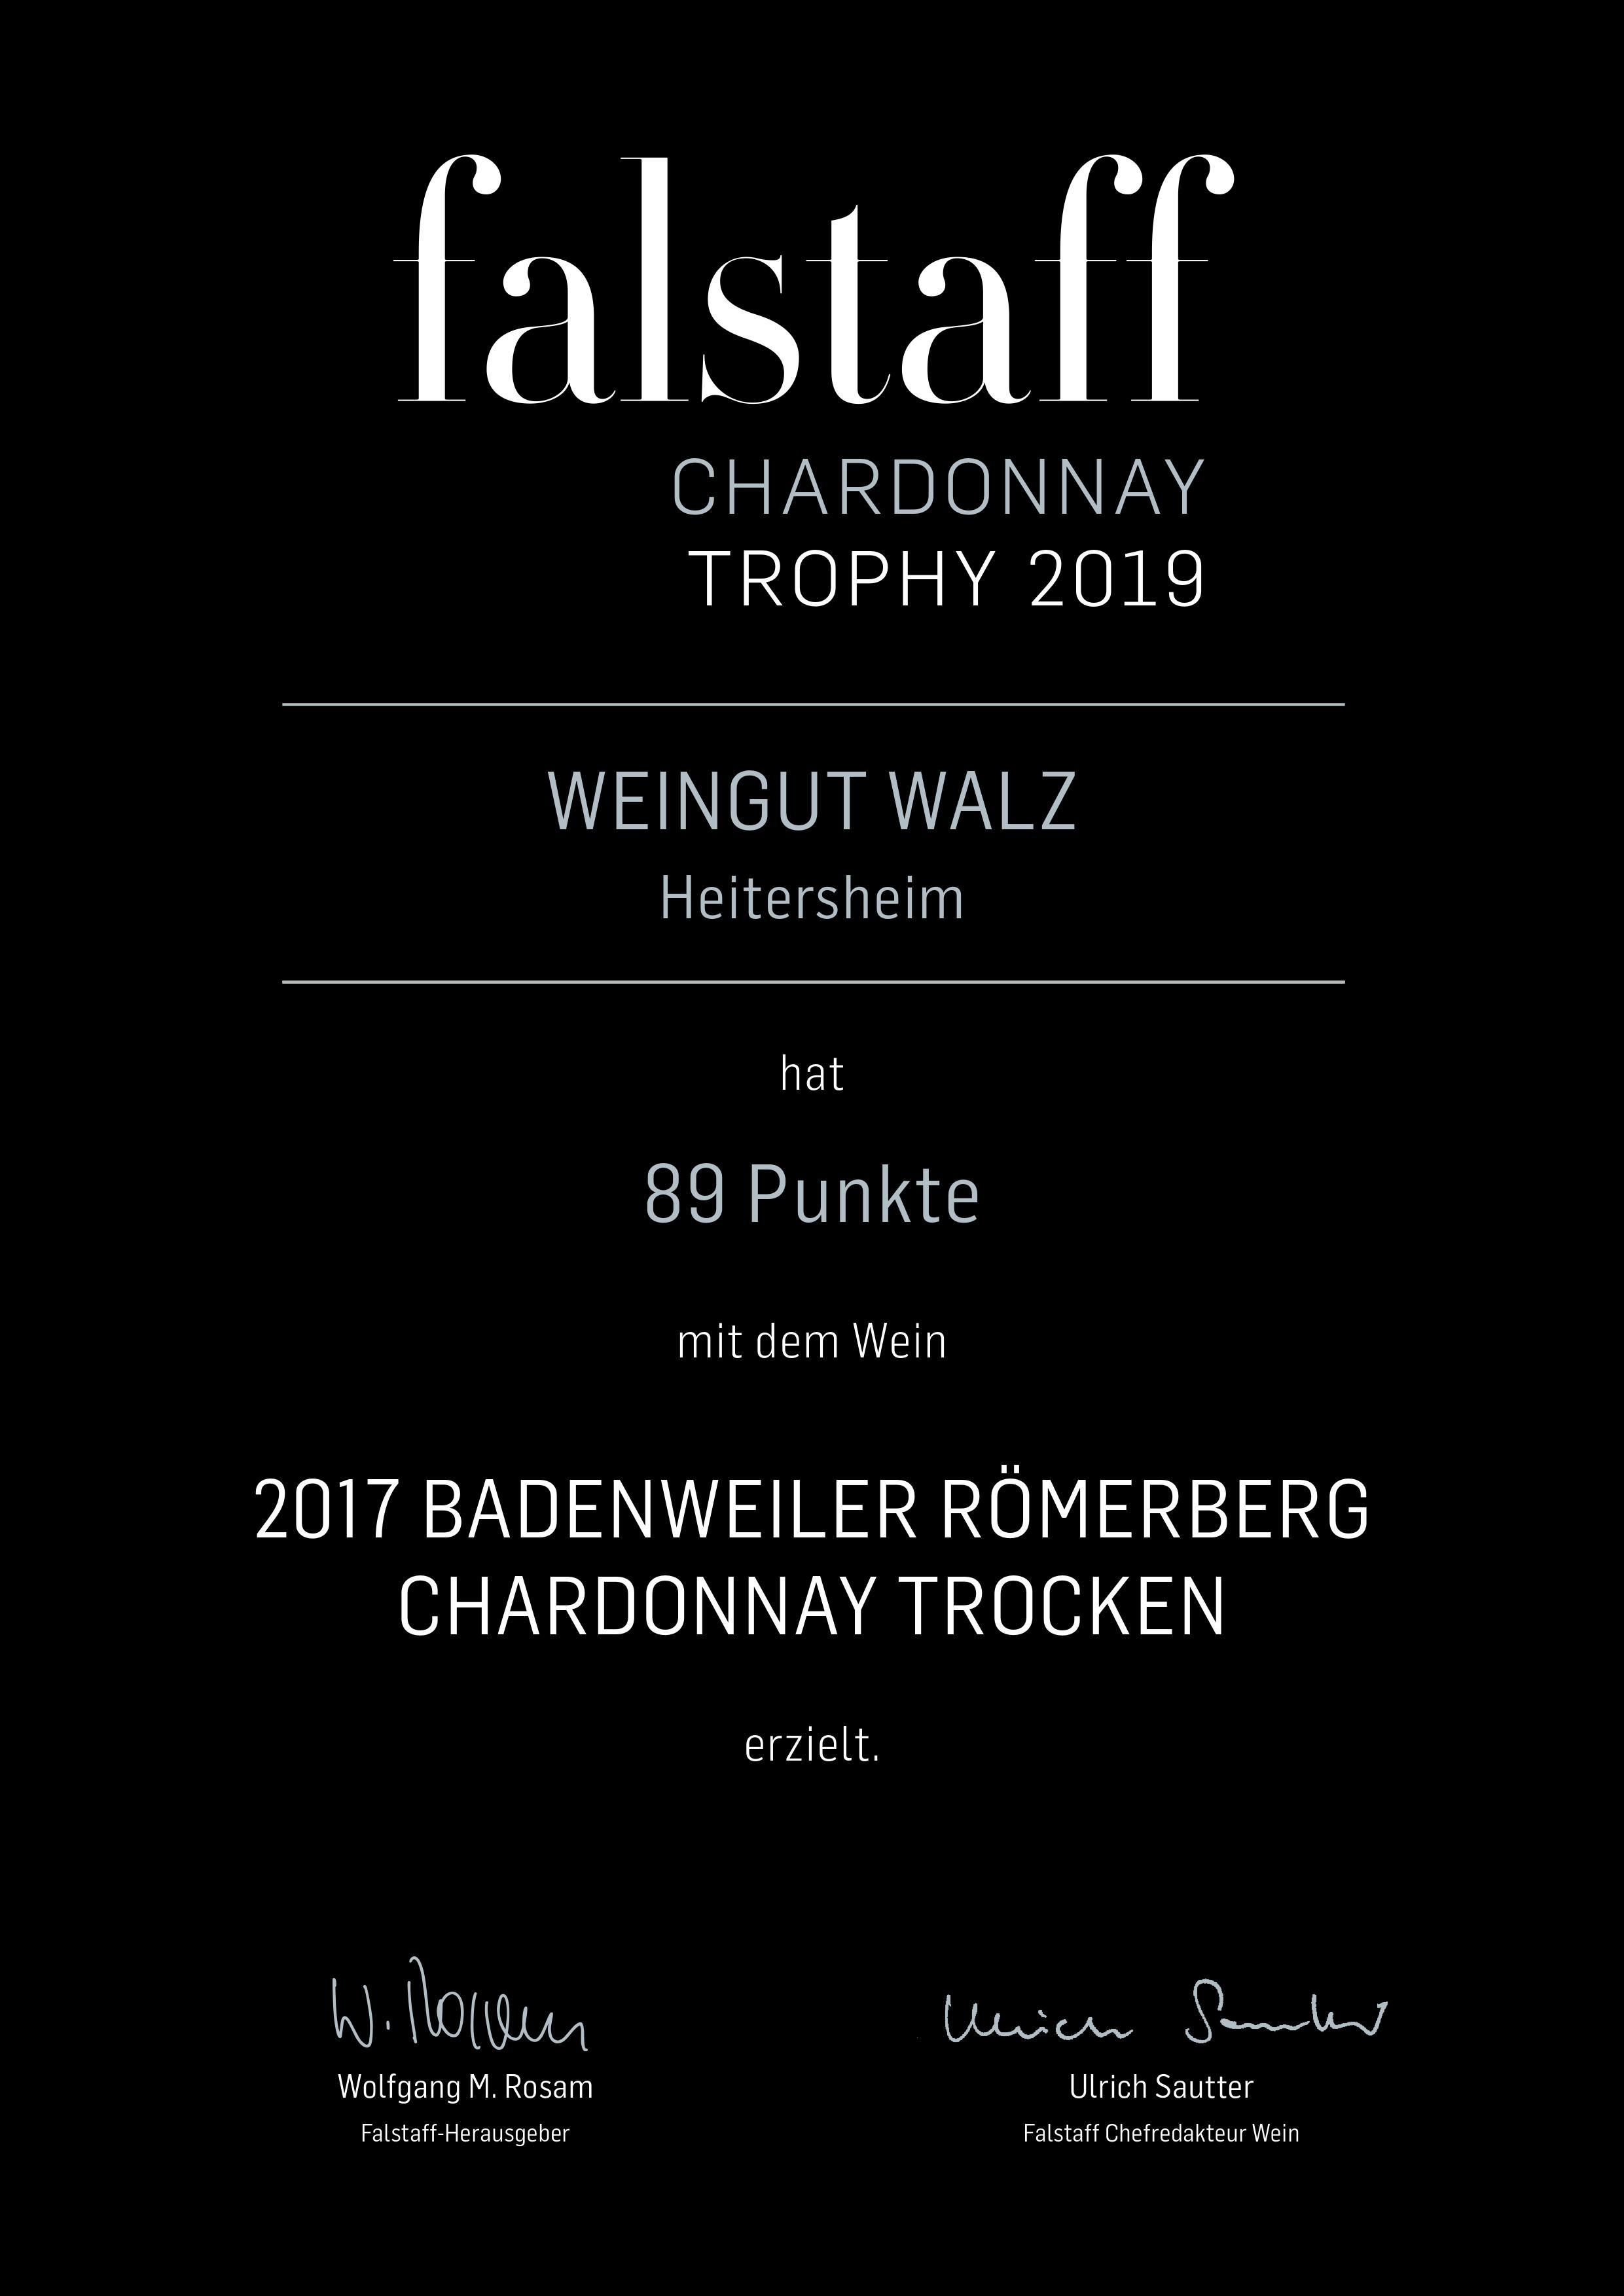 falstaff Chardonnay Trophy 2019 Urkunde Weingut Josef Walz